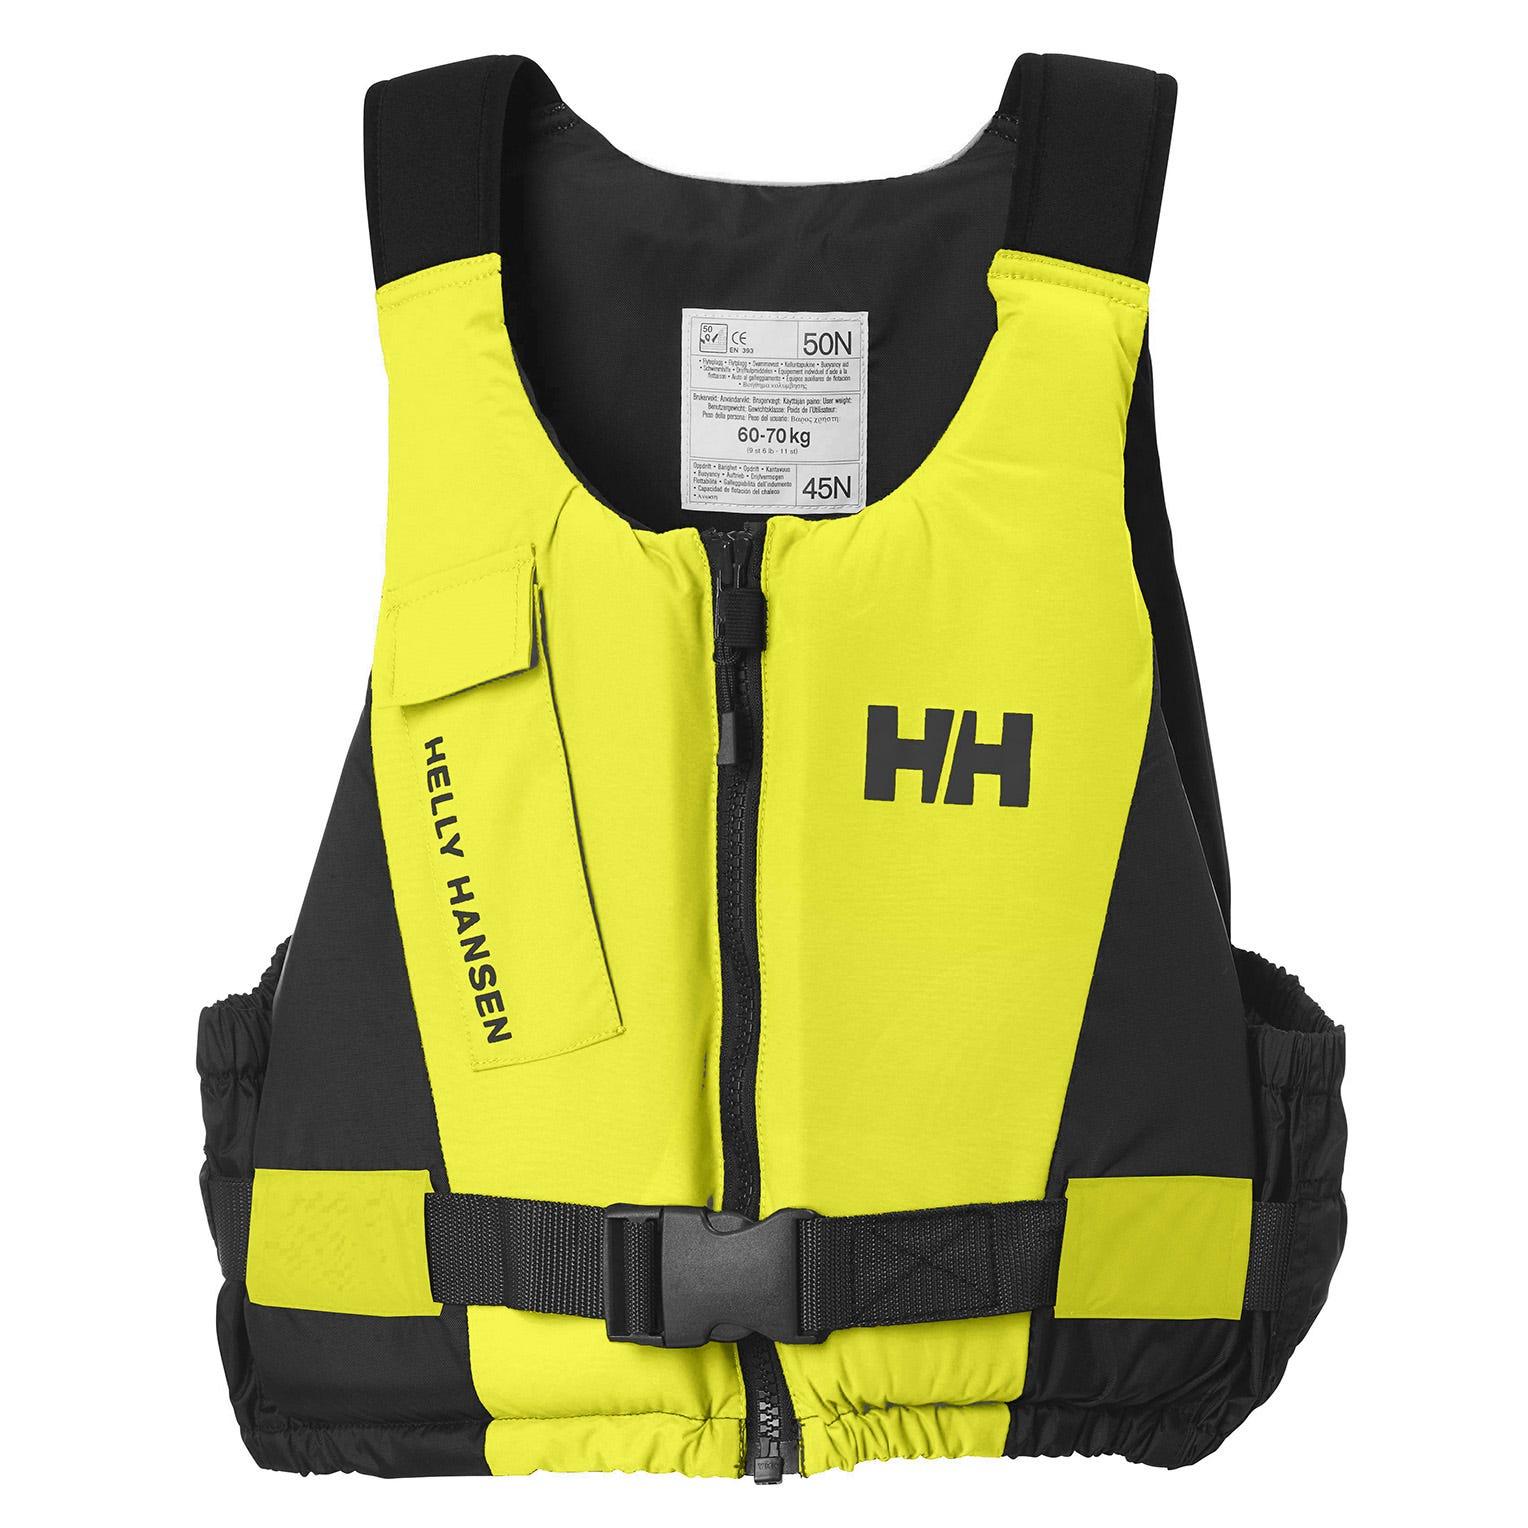 Helly Hansen Rider linne Life Gul 30/40KG